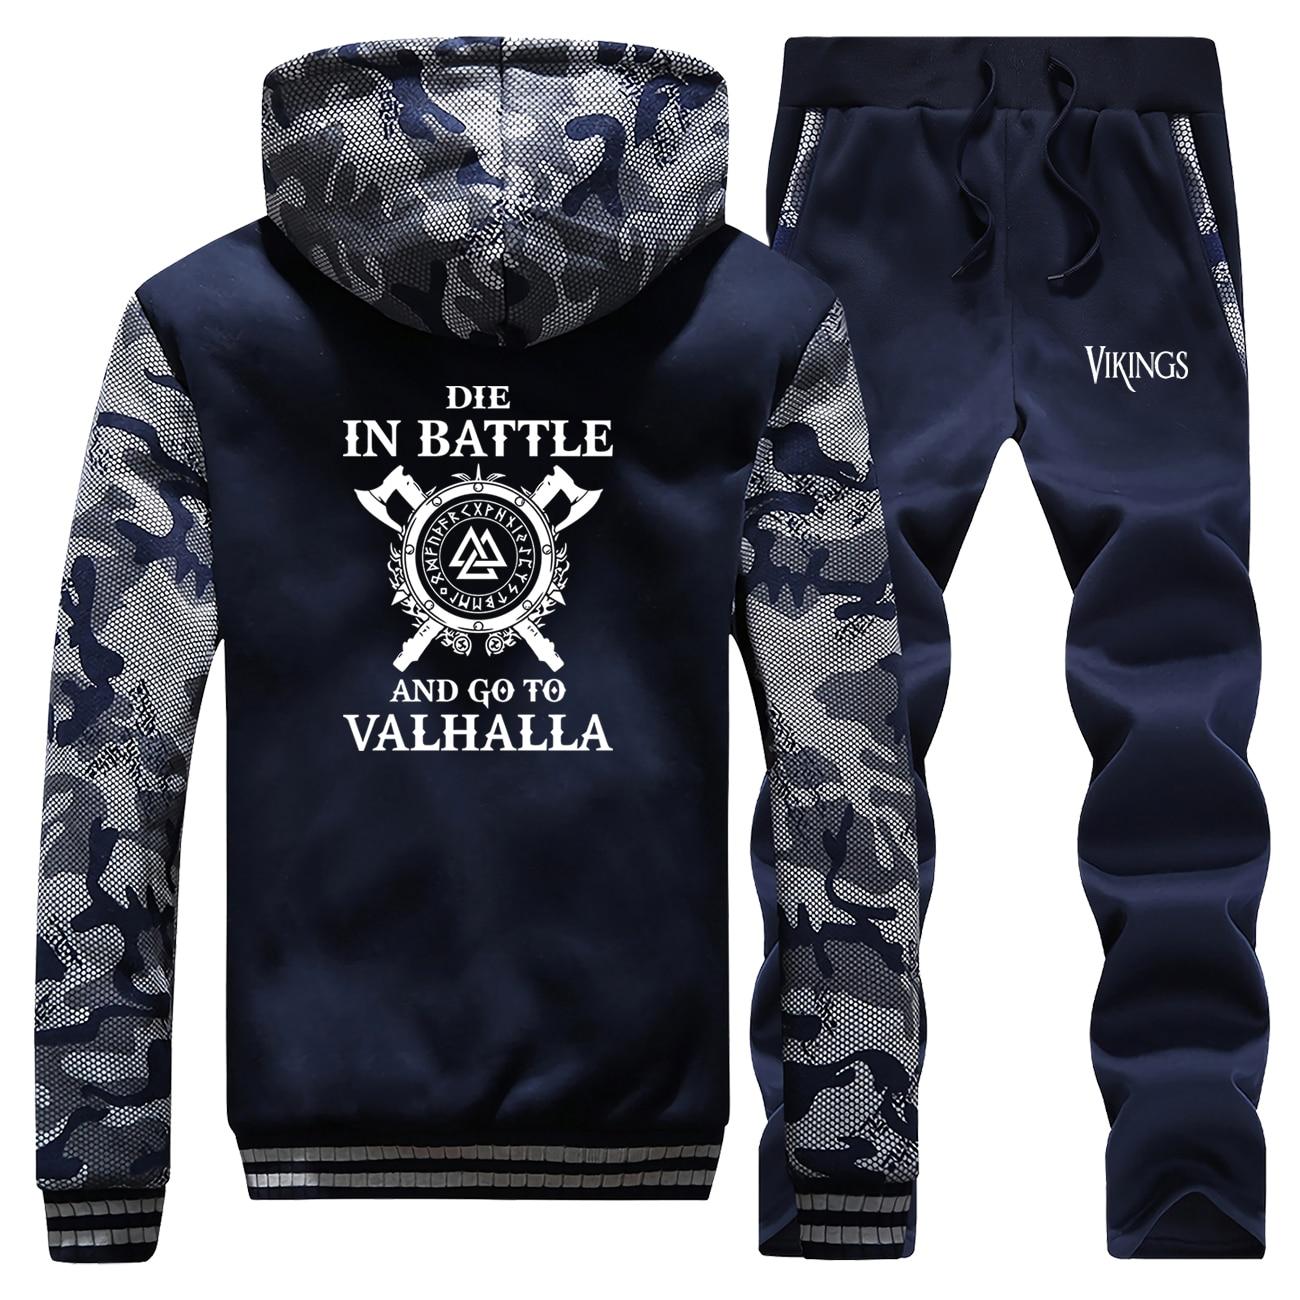 Vikings Winter Hot Sale Vintage Print Mens Hoodies Camouflage Coat Thick Suit Jackets Sportswear Long Sleeve+Pants 2 Piece Set